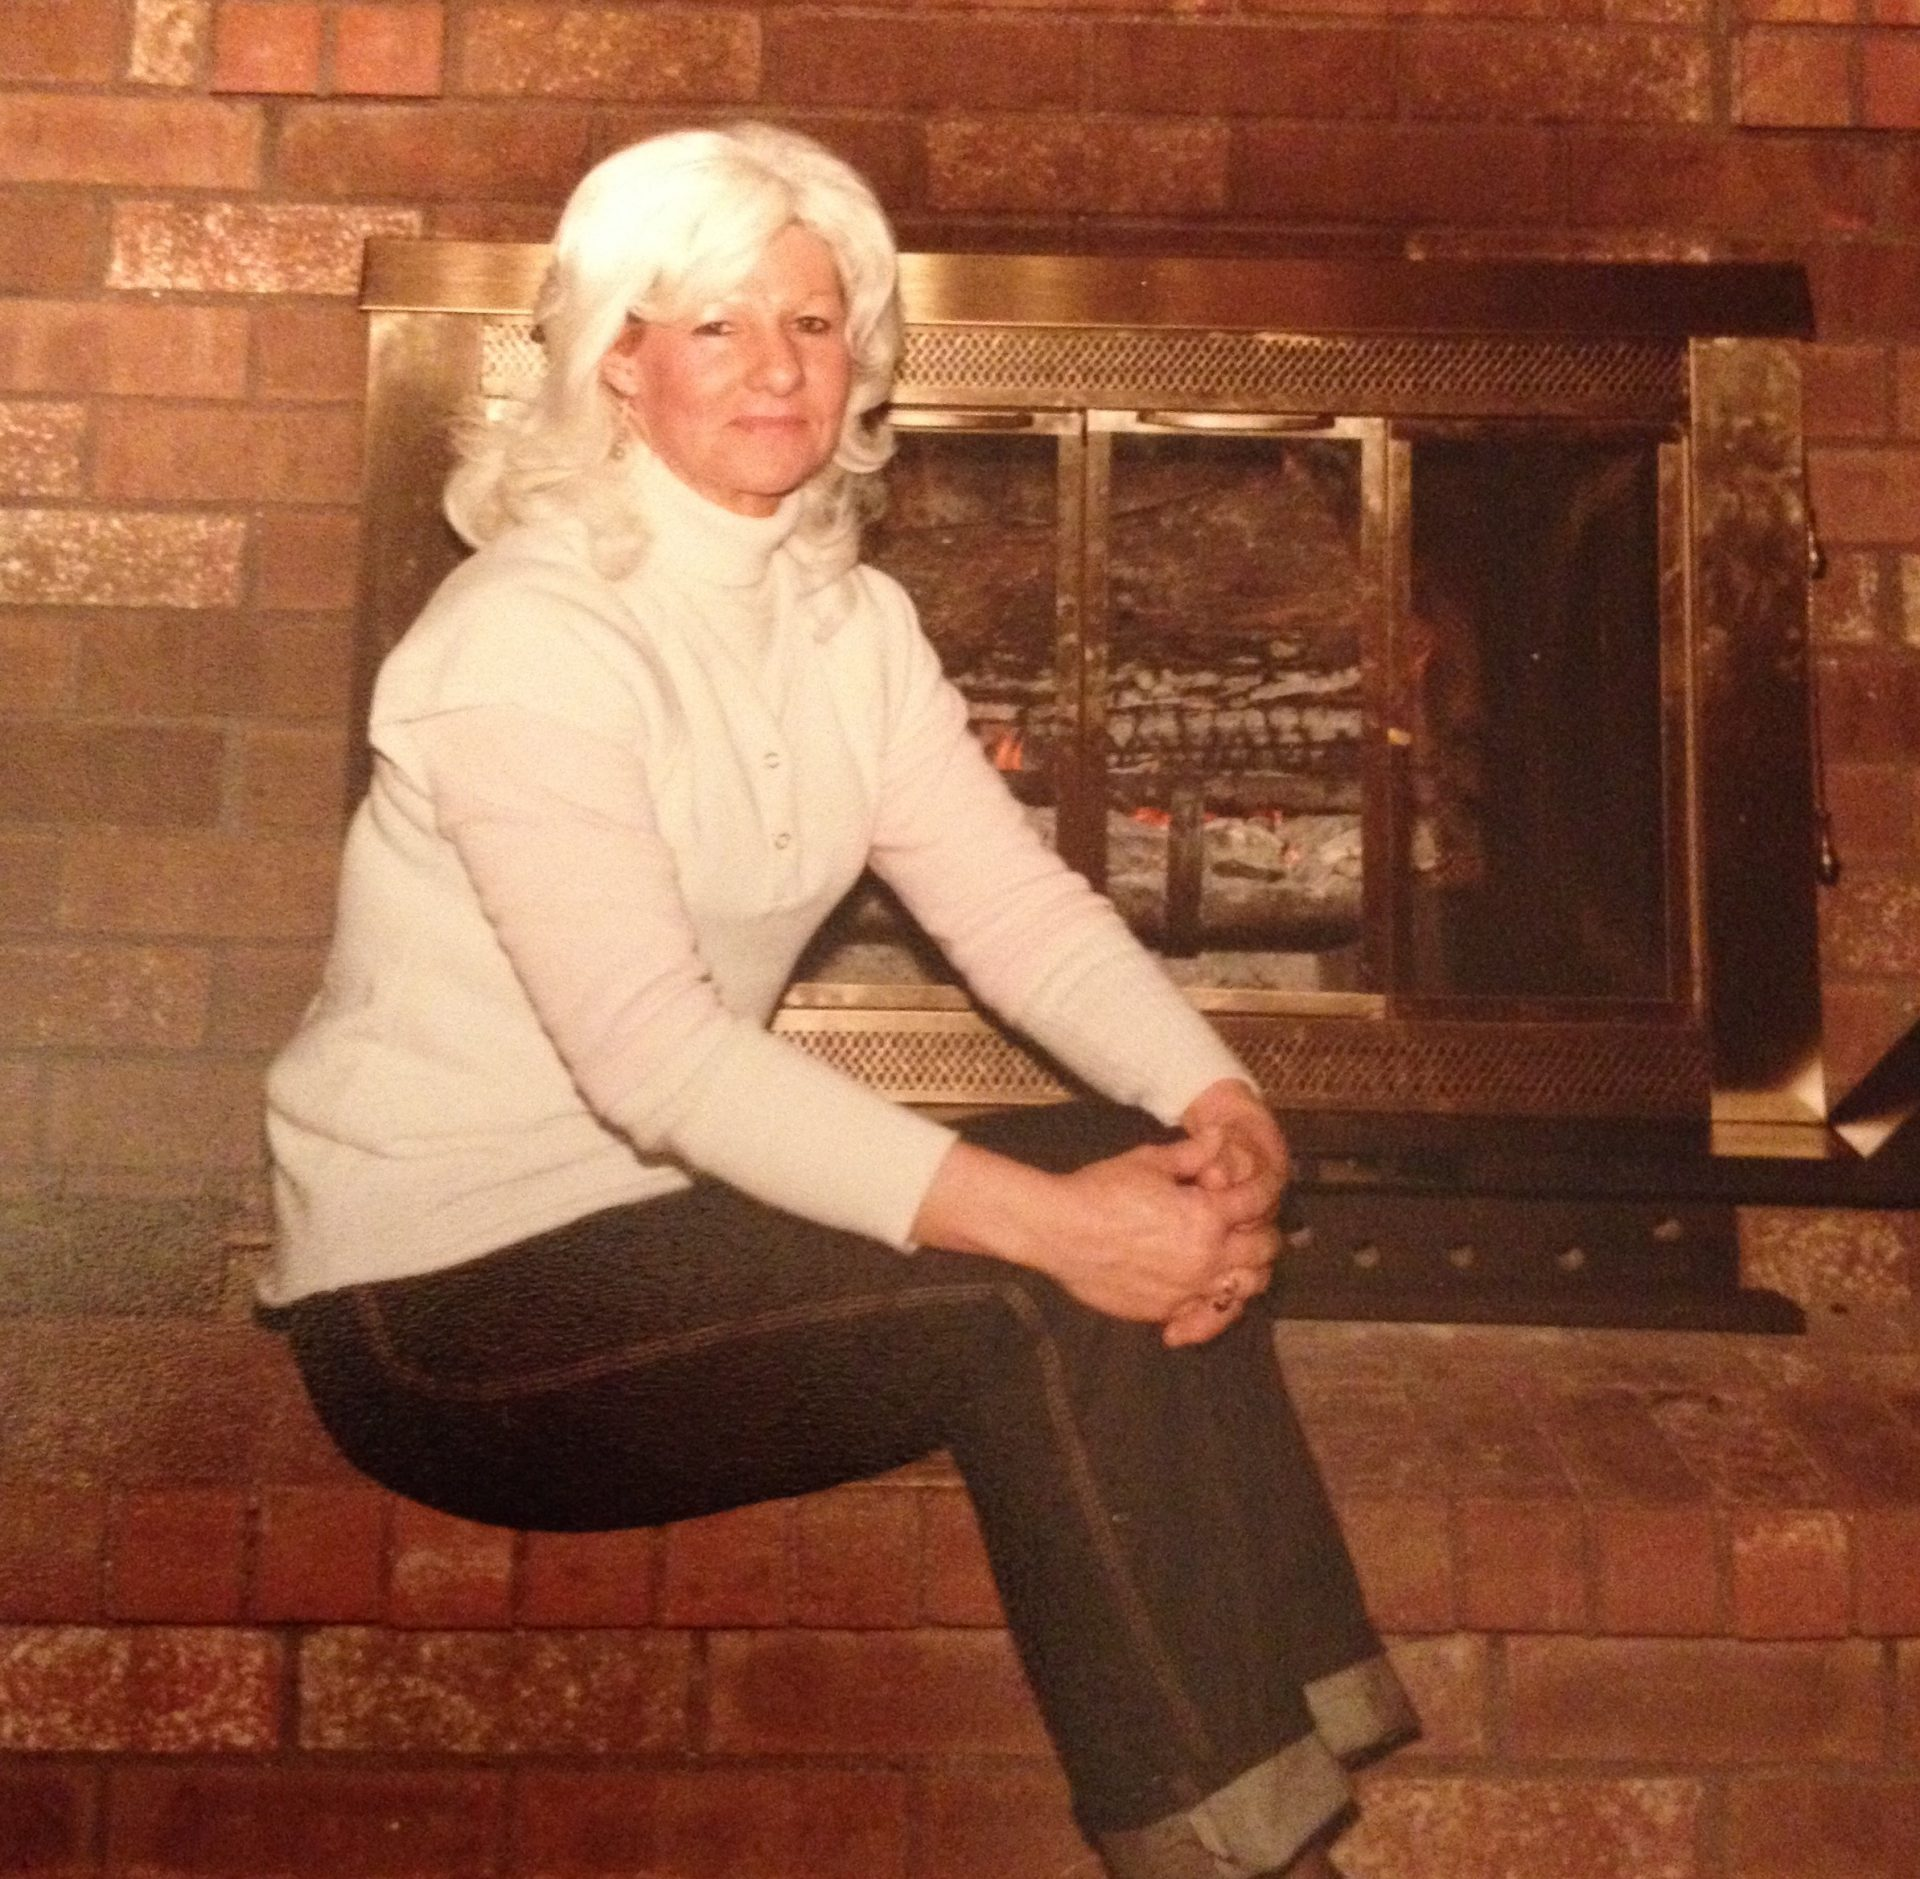 Mom enjoying the fireplace